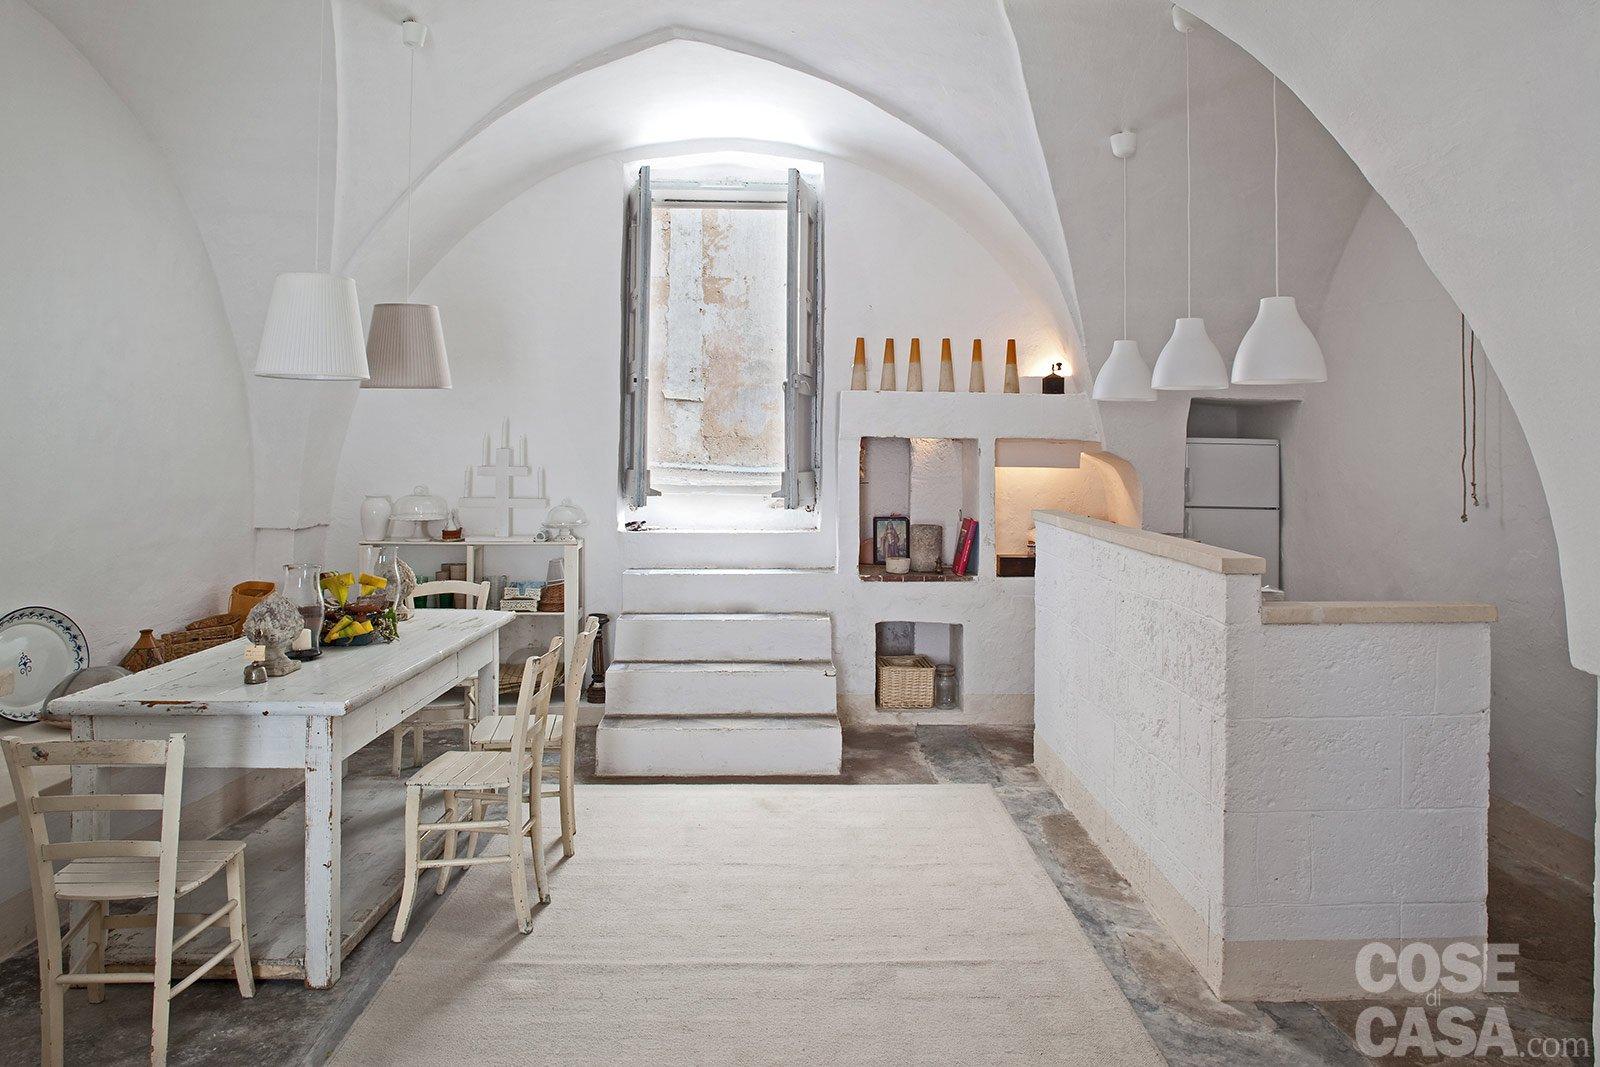 Una casa in pietra in stile mediterraneo cose di casa for Interni ristrutturati